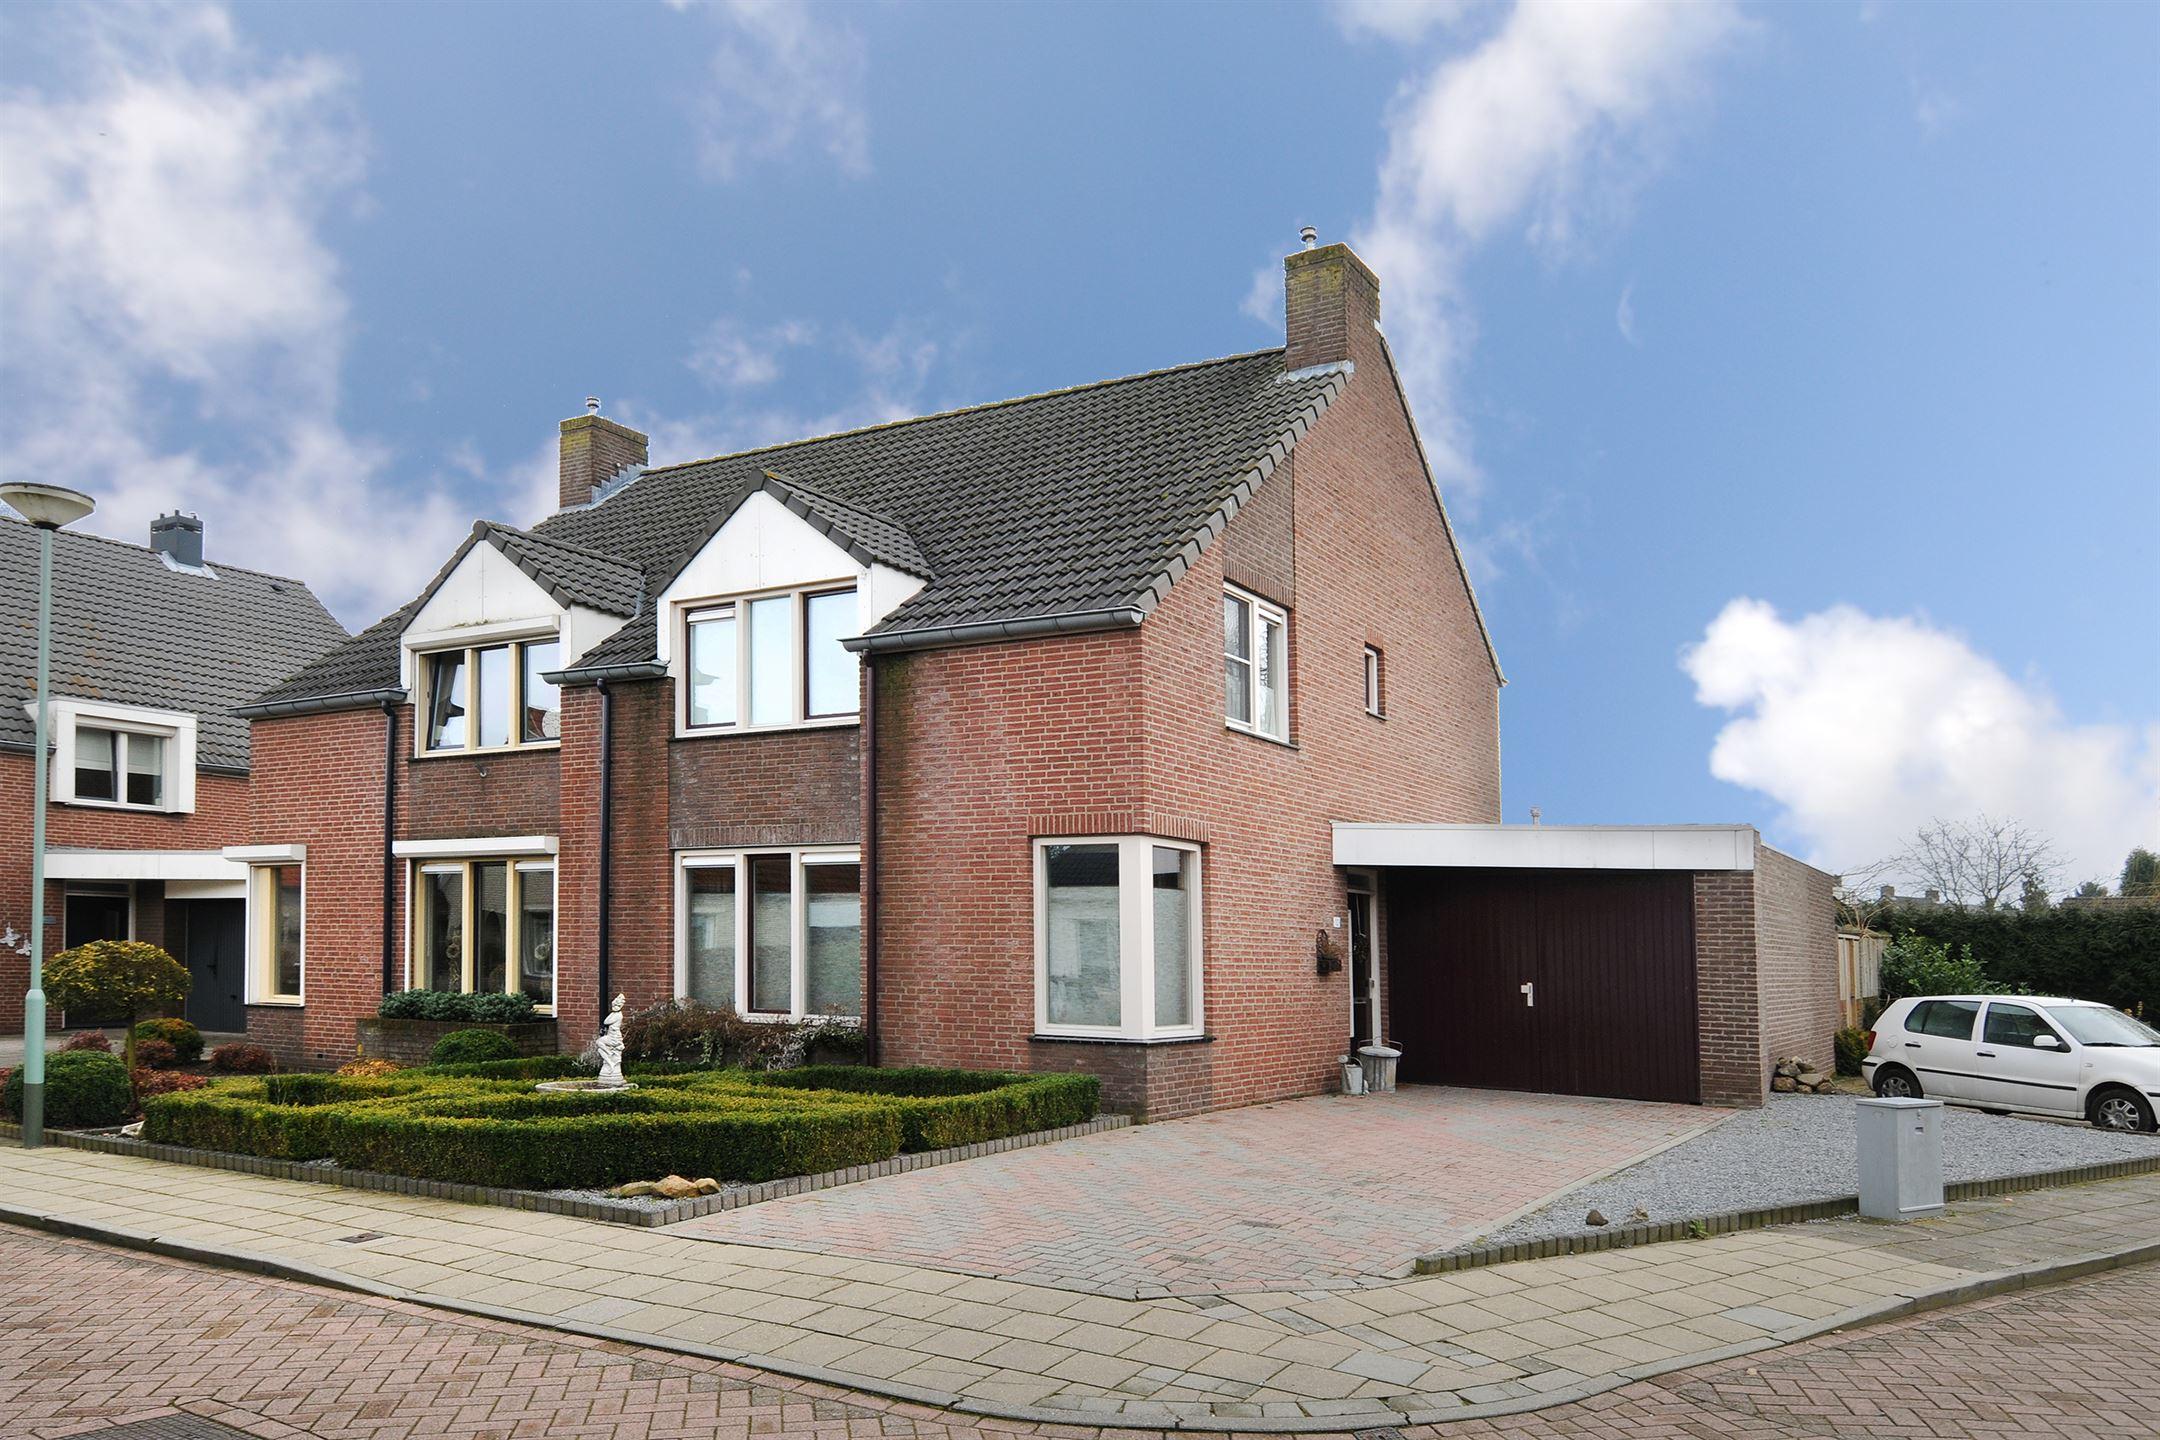 Huis te koop kuypershof 12 5995 ng kessel funda for Mijn huis op funda